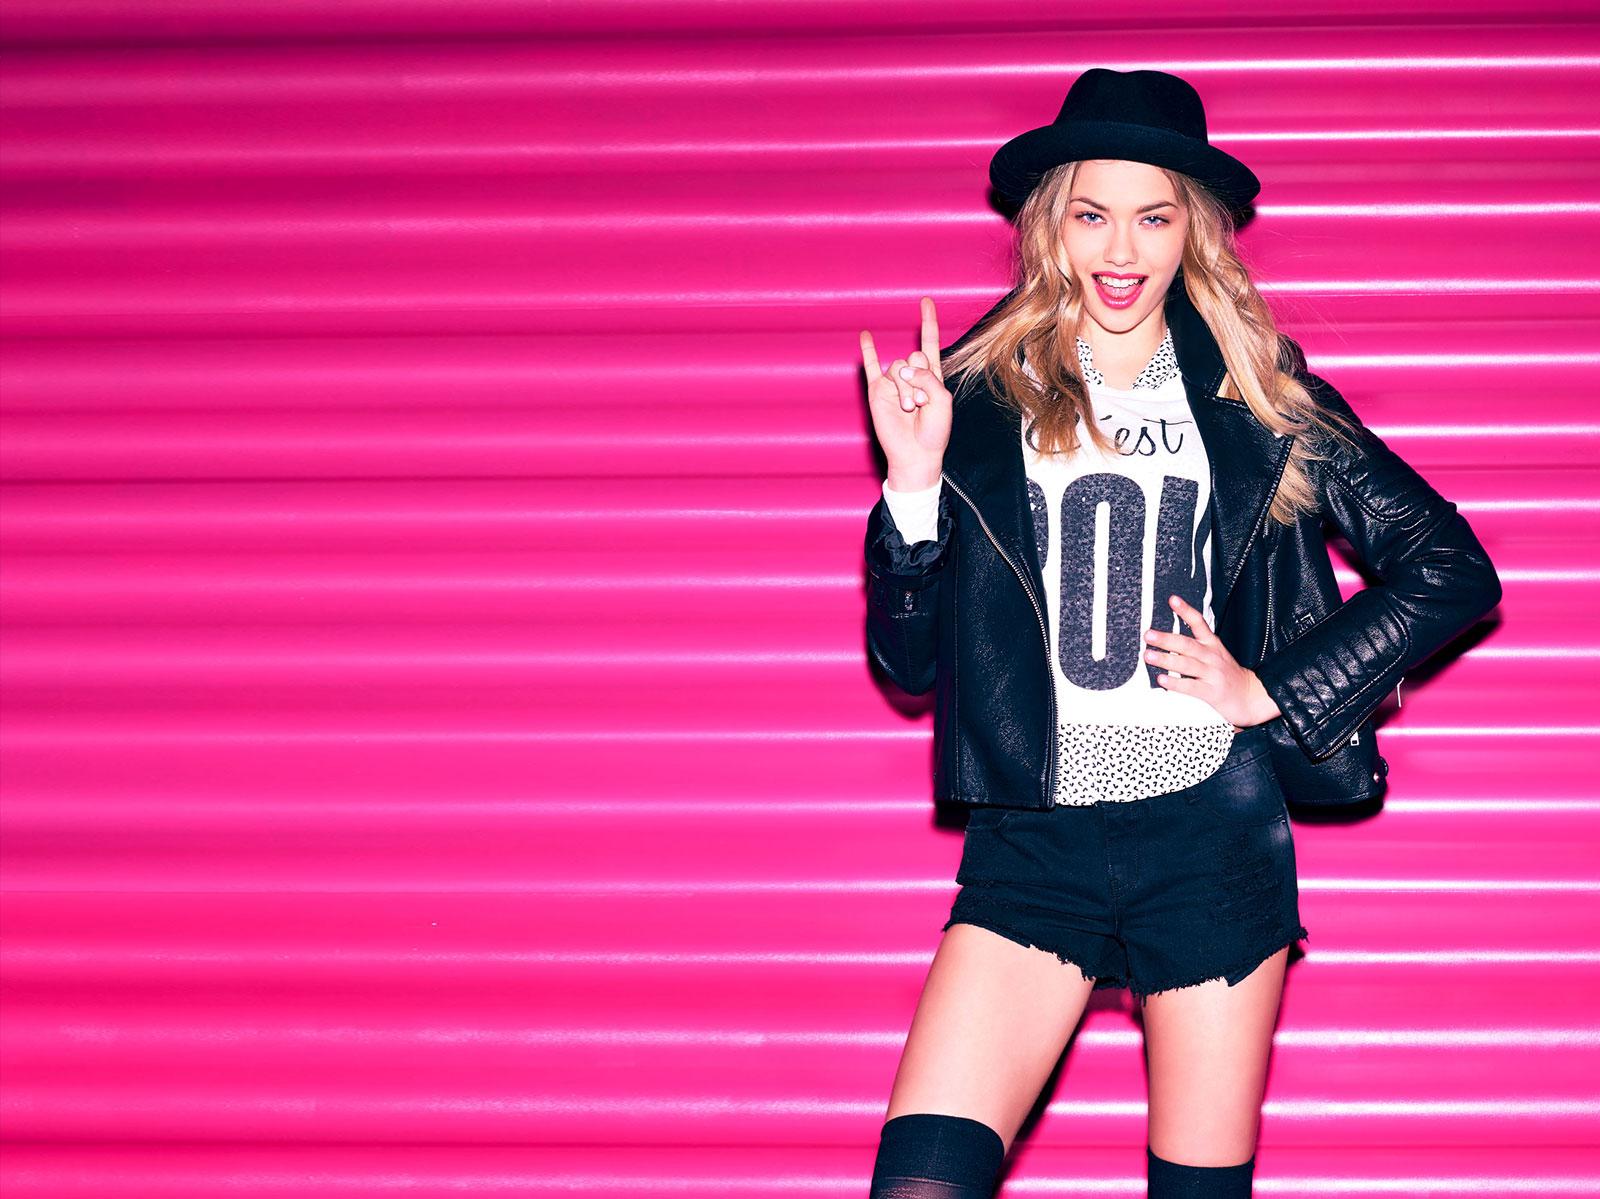 New yorker: fashion & lifestyle